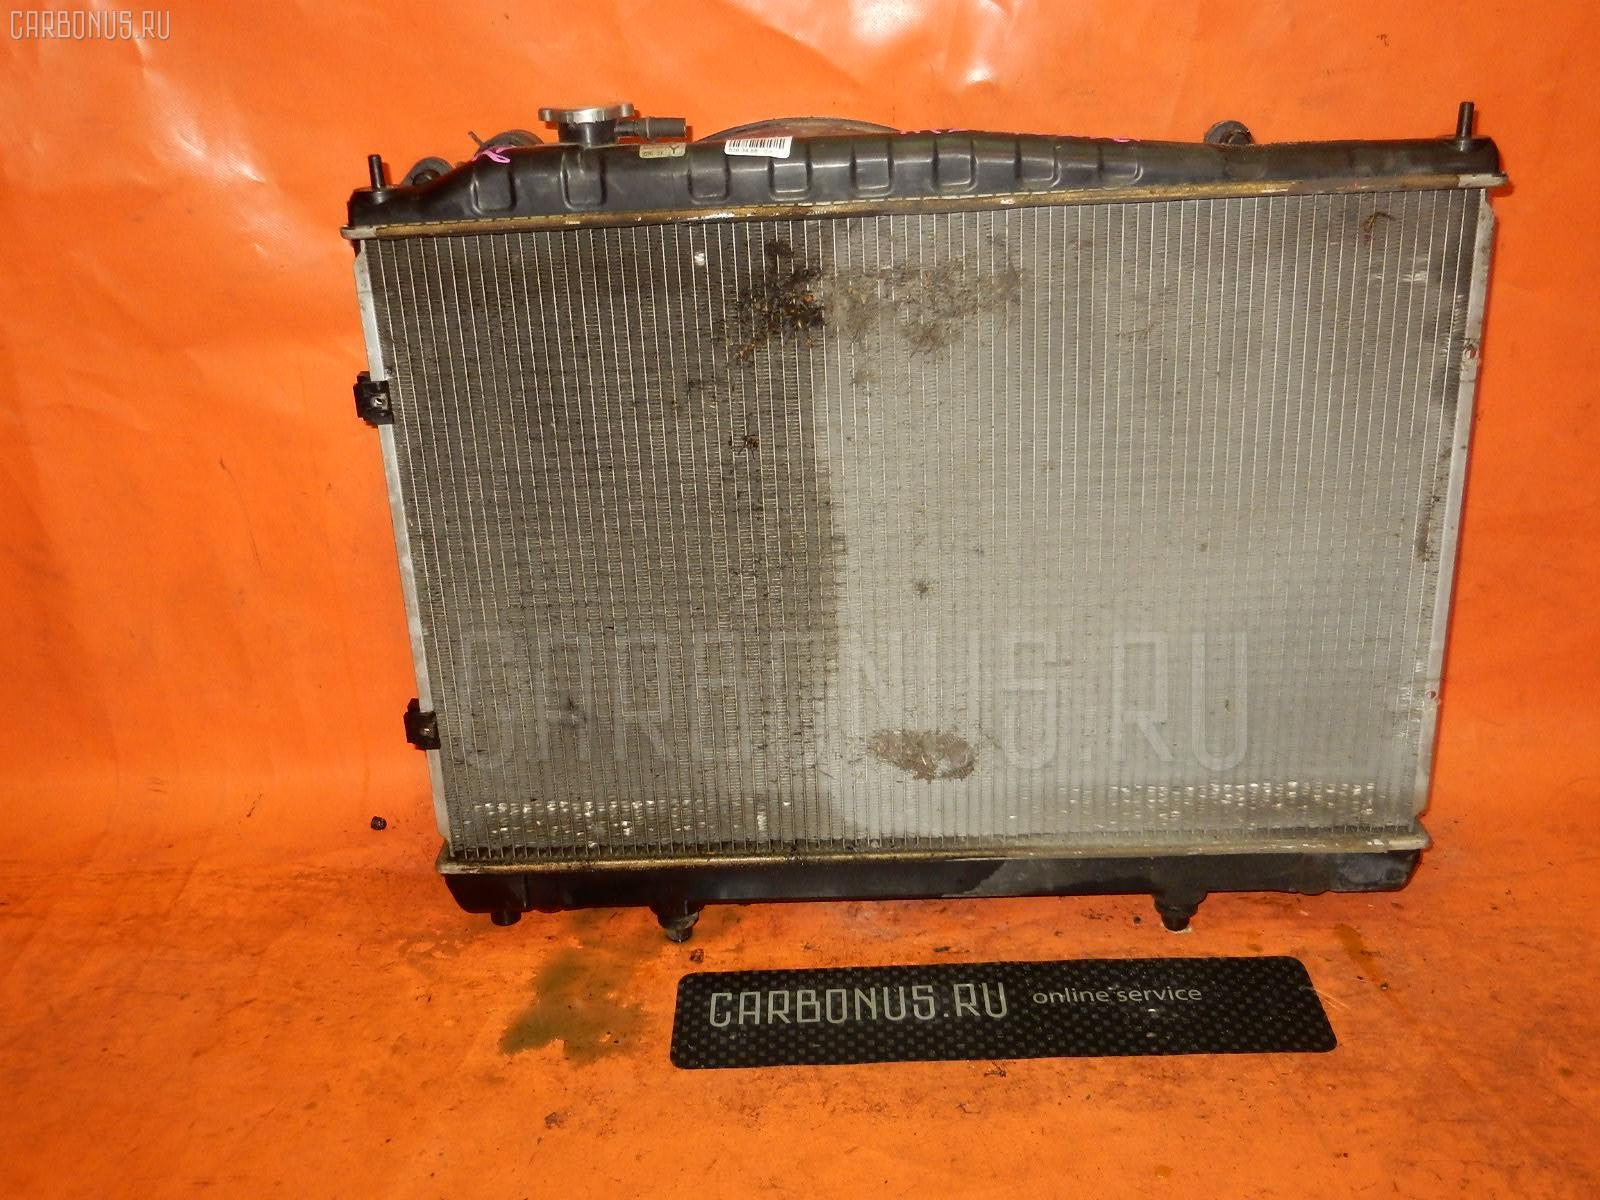 Радиатор ДВС NISSAN CEDRIC HY34 VQ30DET. Фото 2